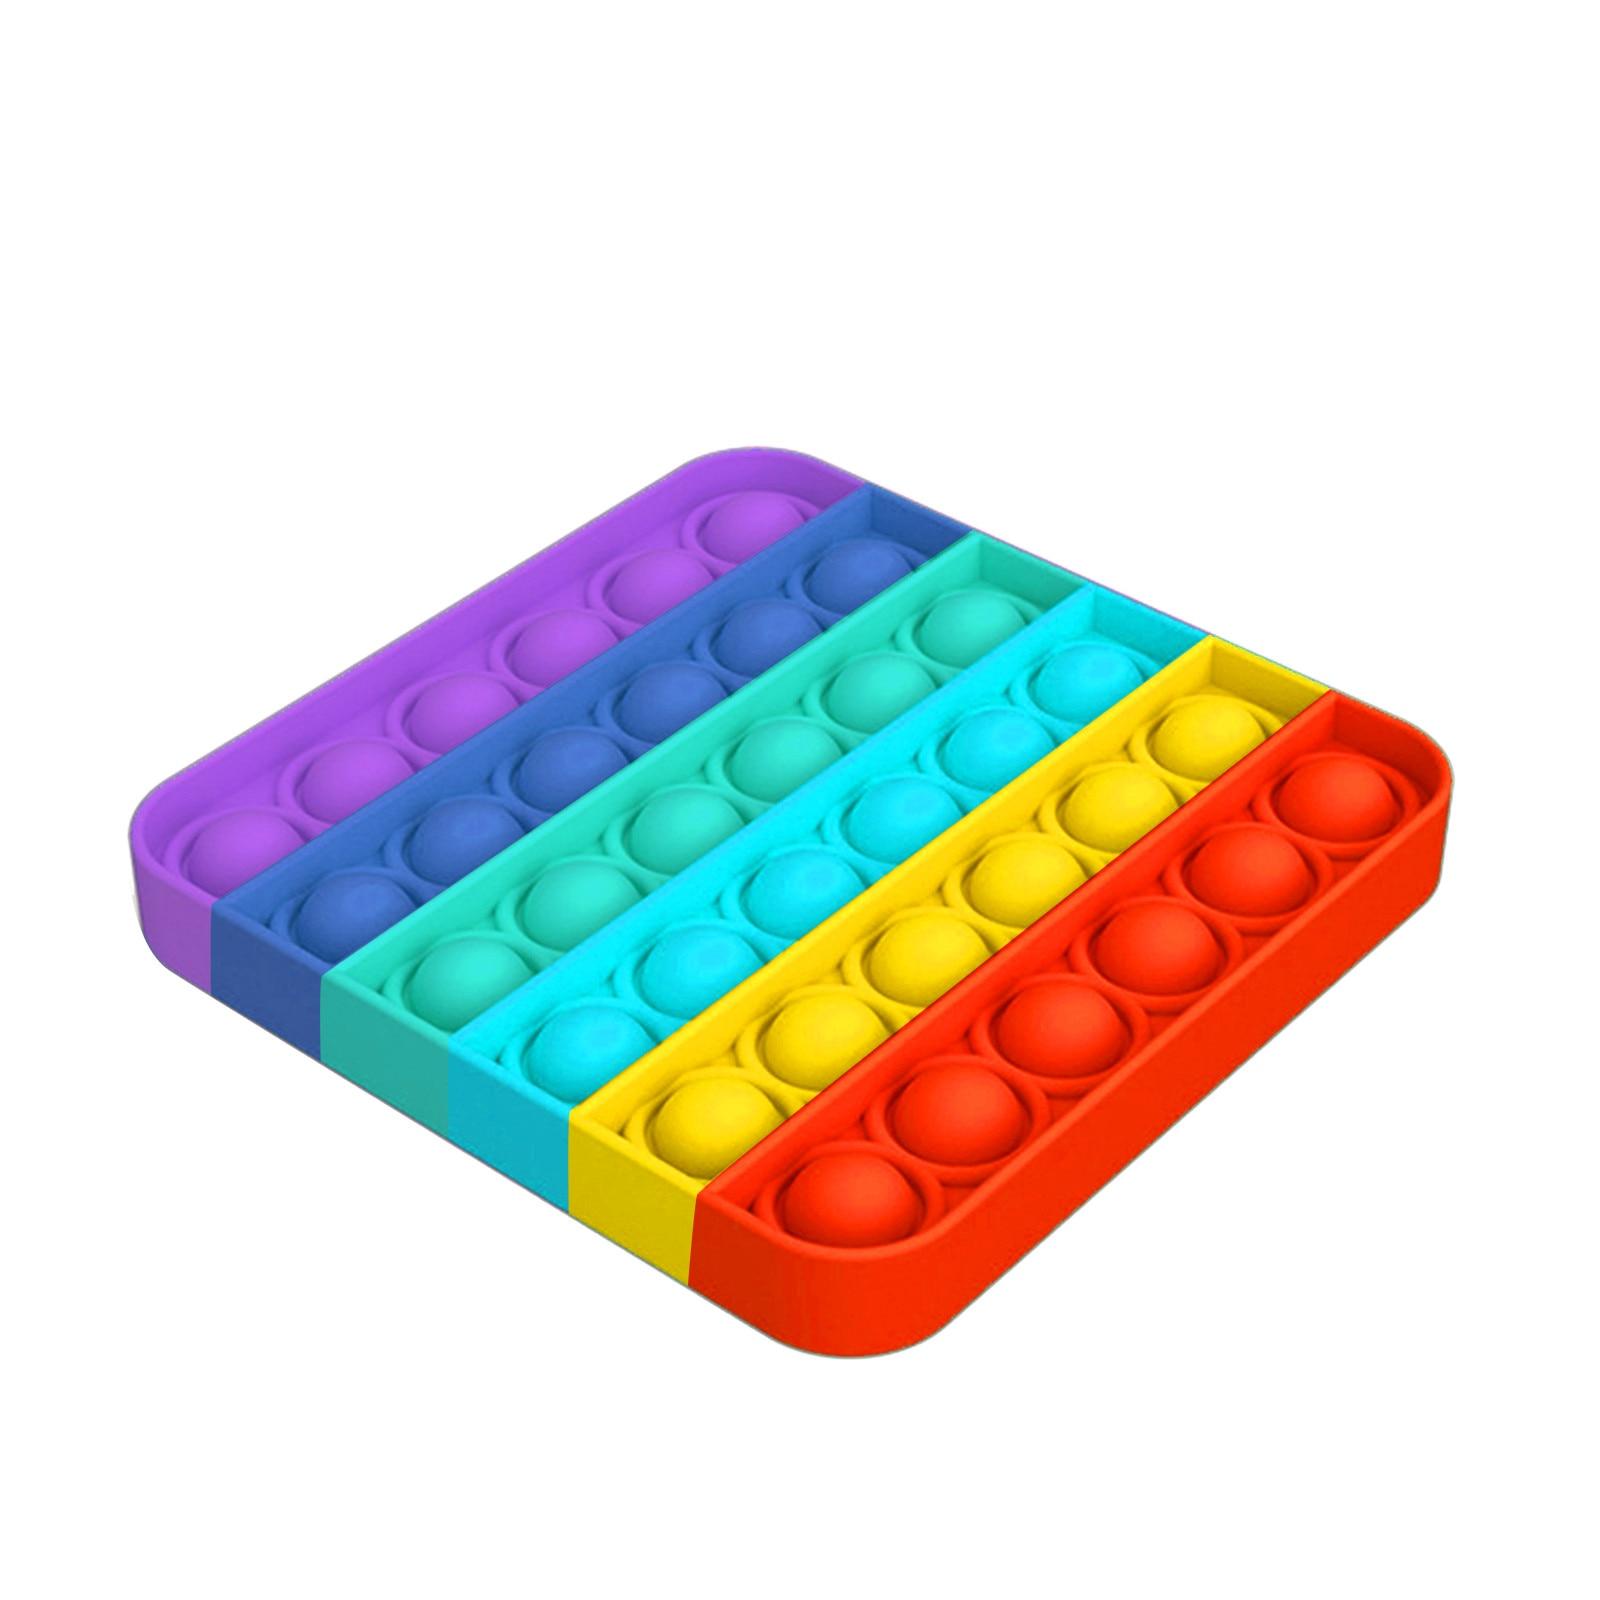 Fidget-Toys Autism Needs-Stress Push-Bubble Poppit Special Simple Dimple Reliever img3